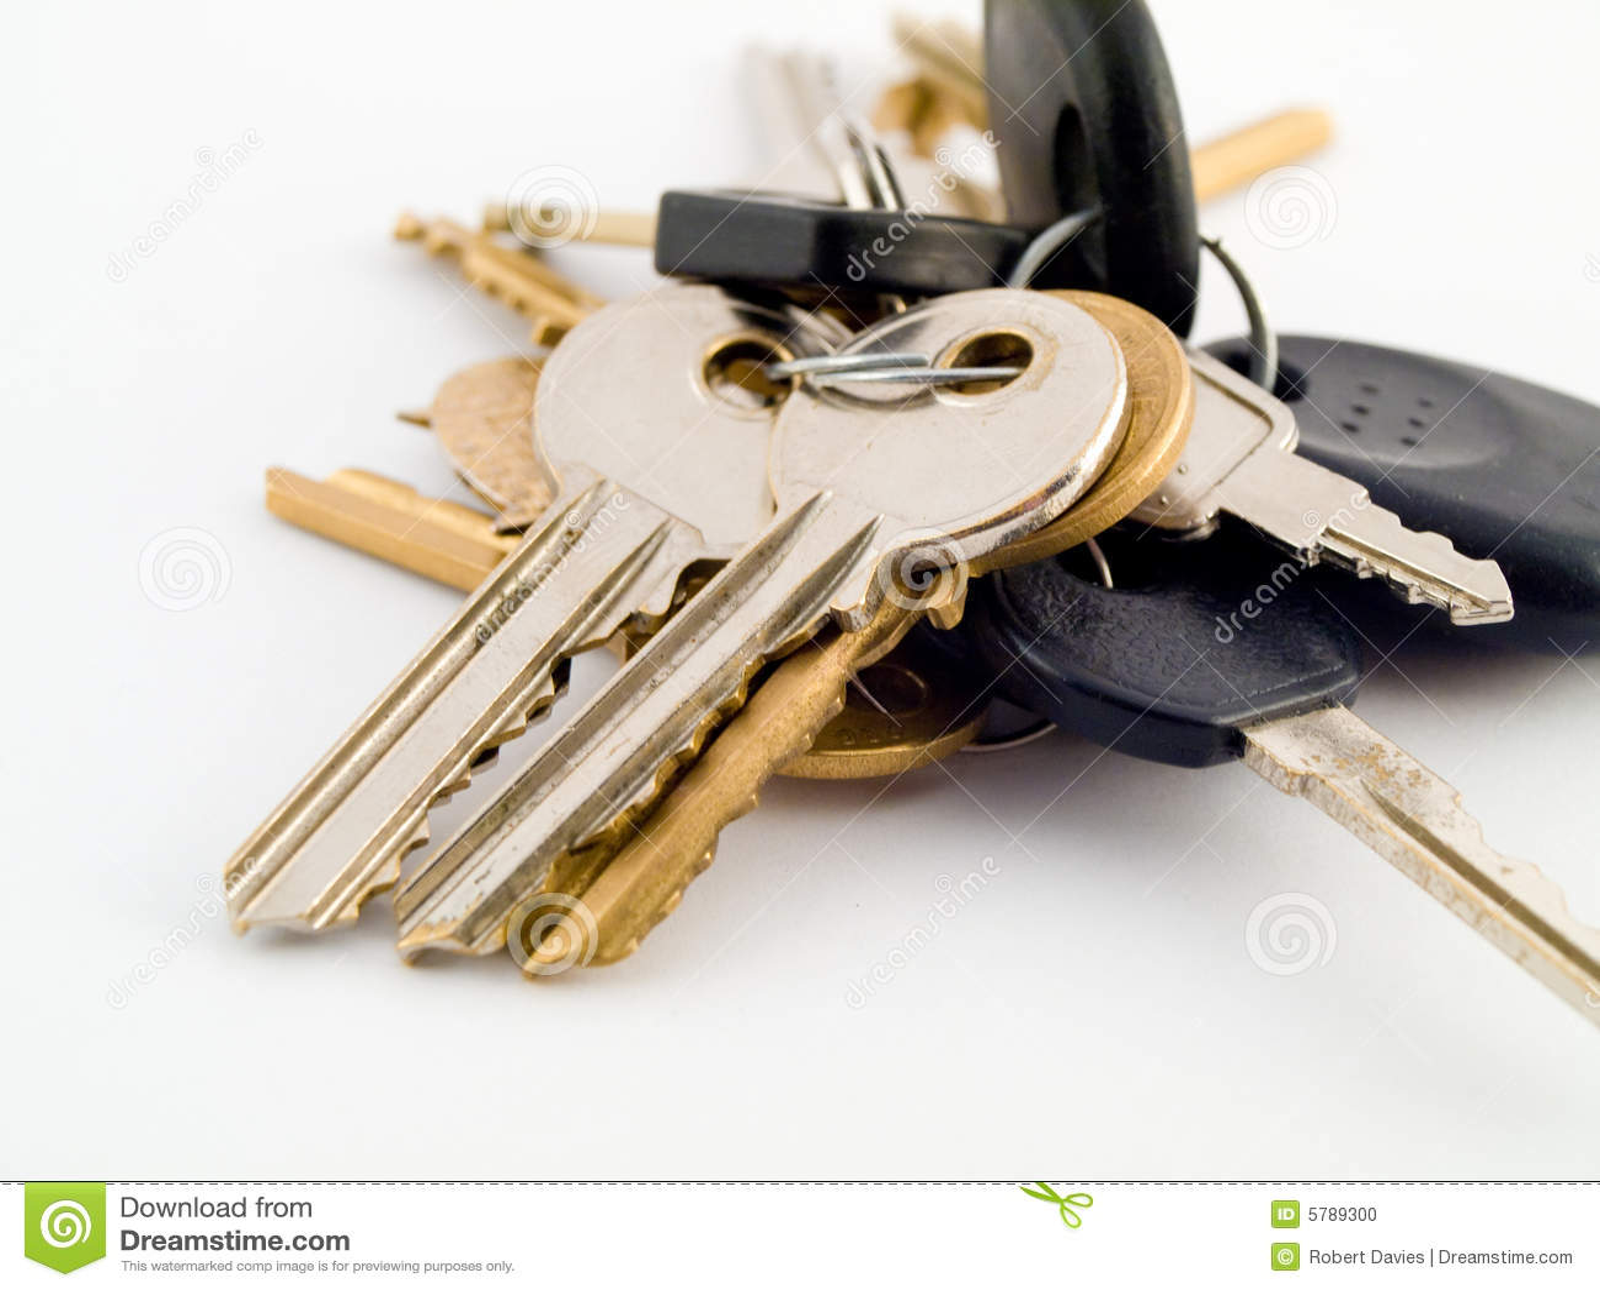 Set Of House And Car Keys On White Background Stock Photo